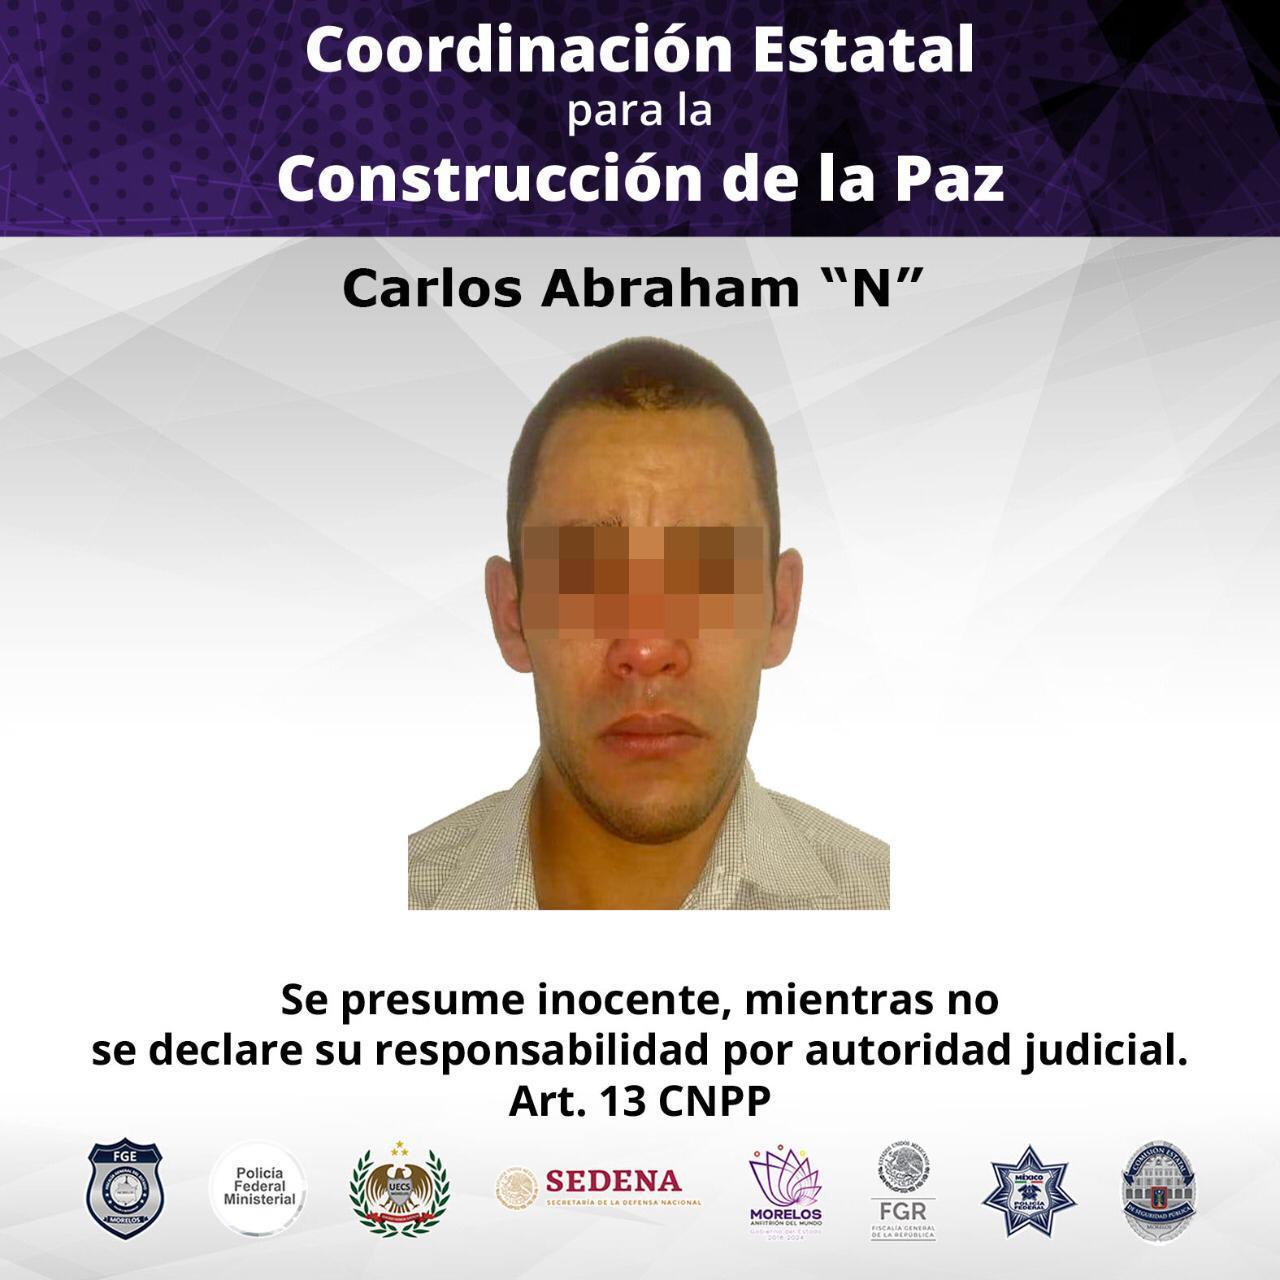 Carlos Abraham